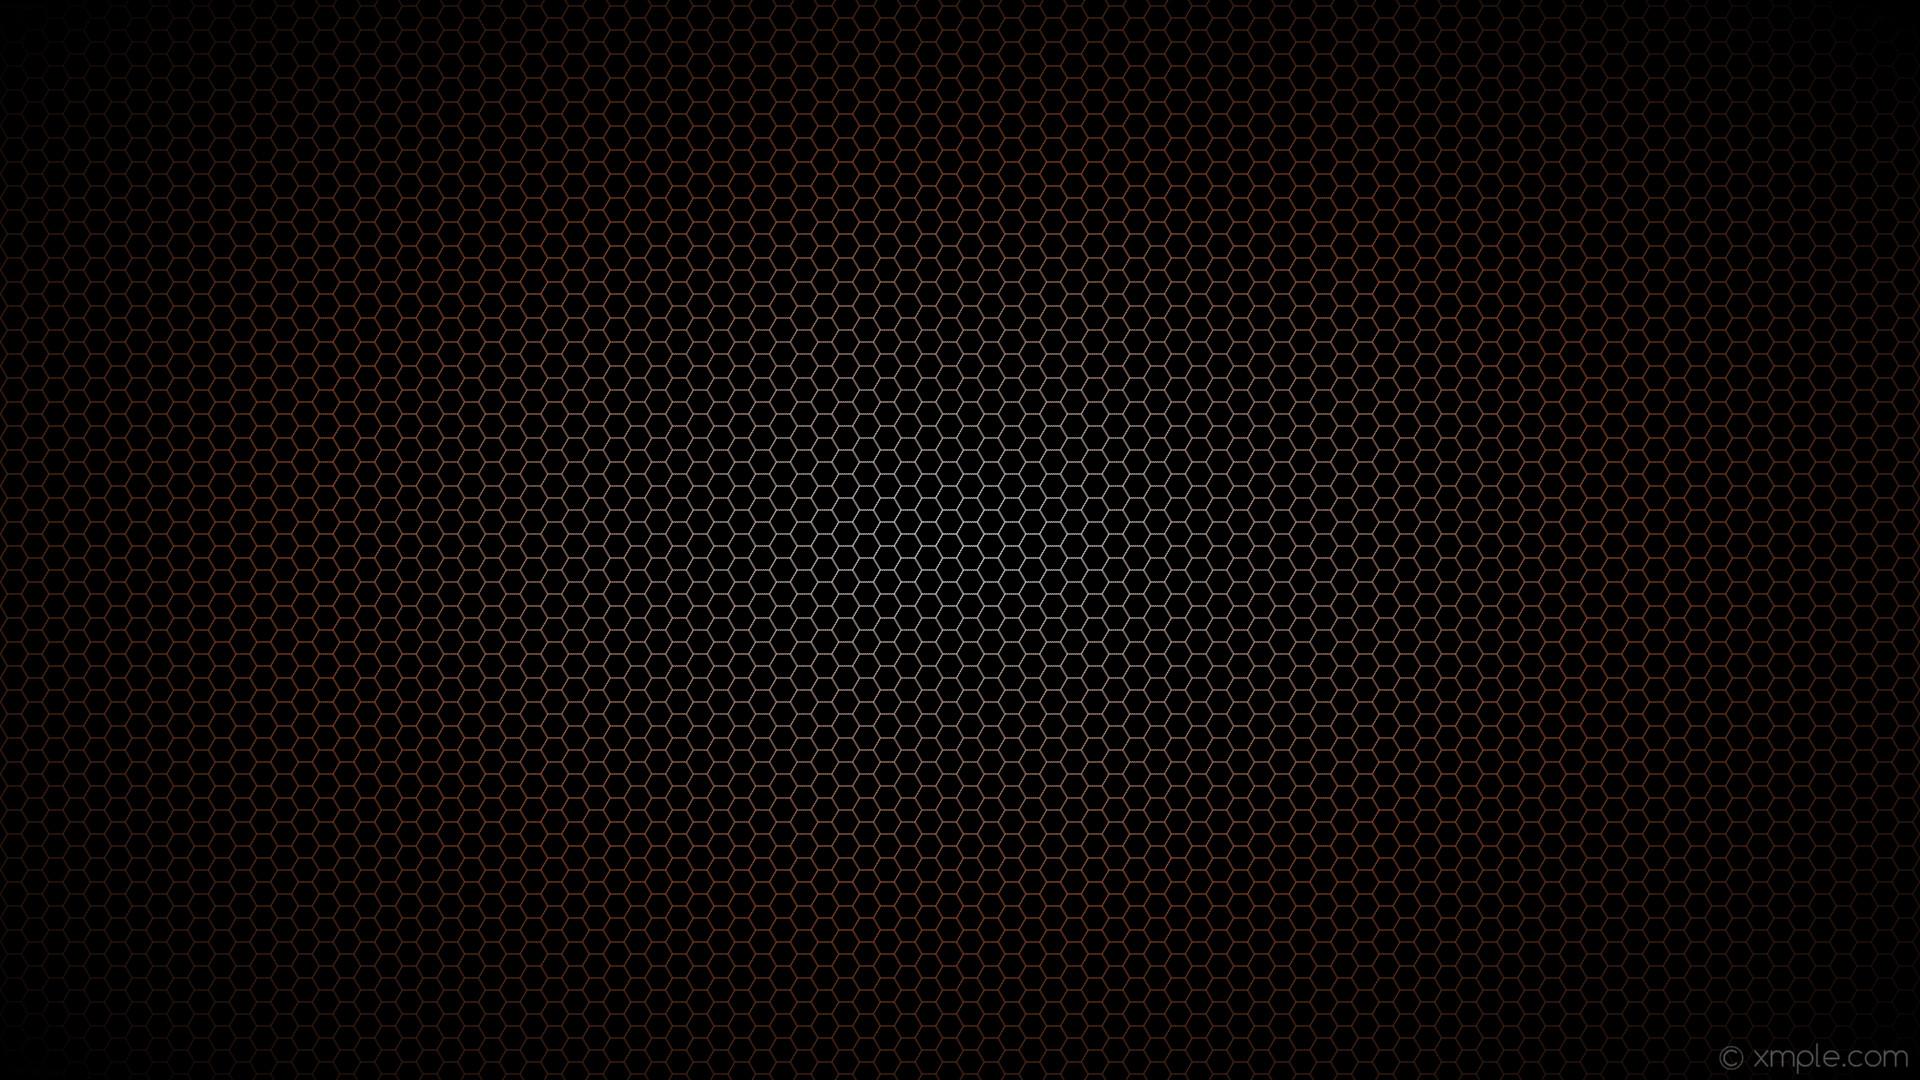 wallpaper black white glow brown hexagon gradient sienna #000000 #ffffff  #a0522d diagonal 30